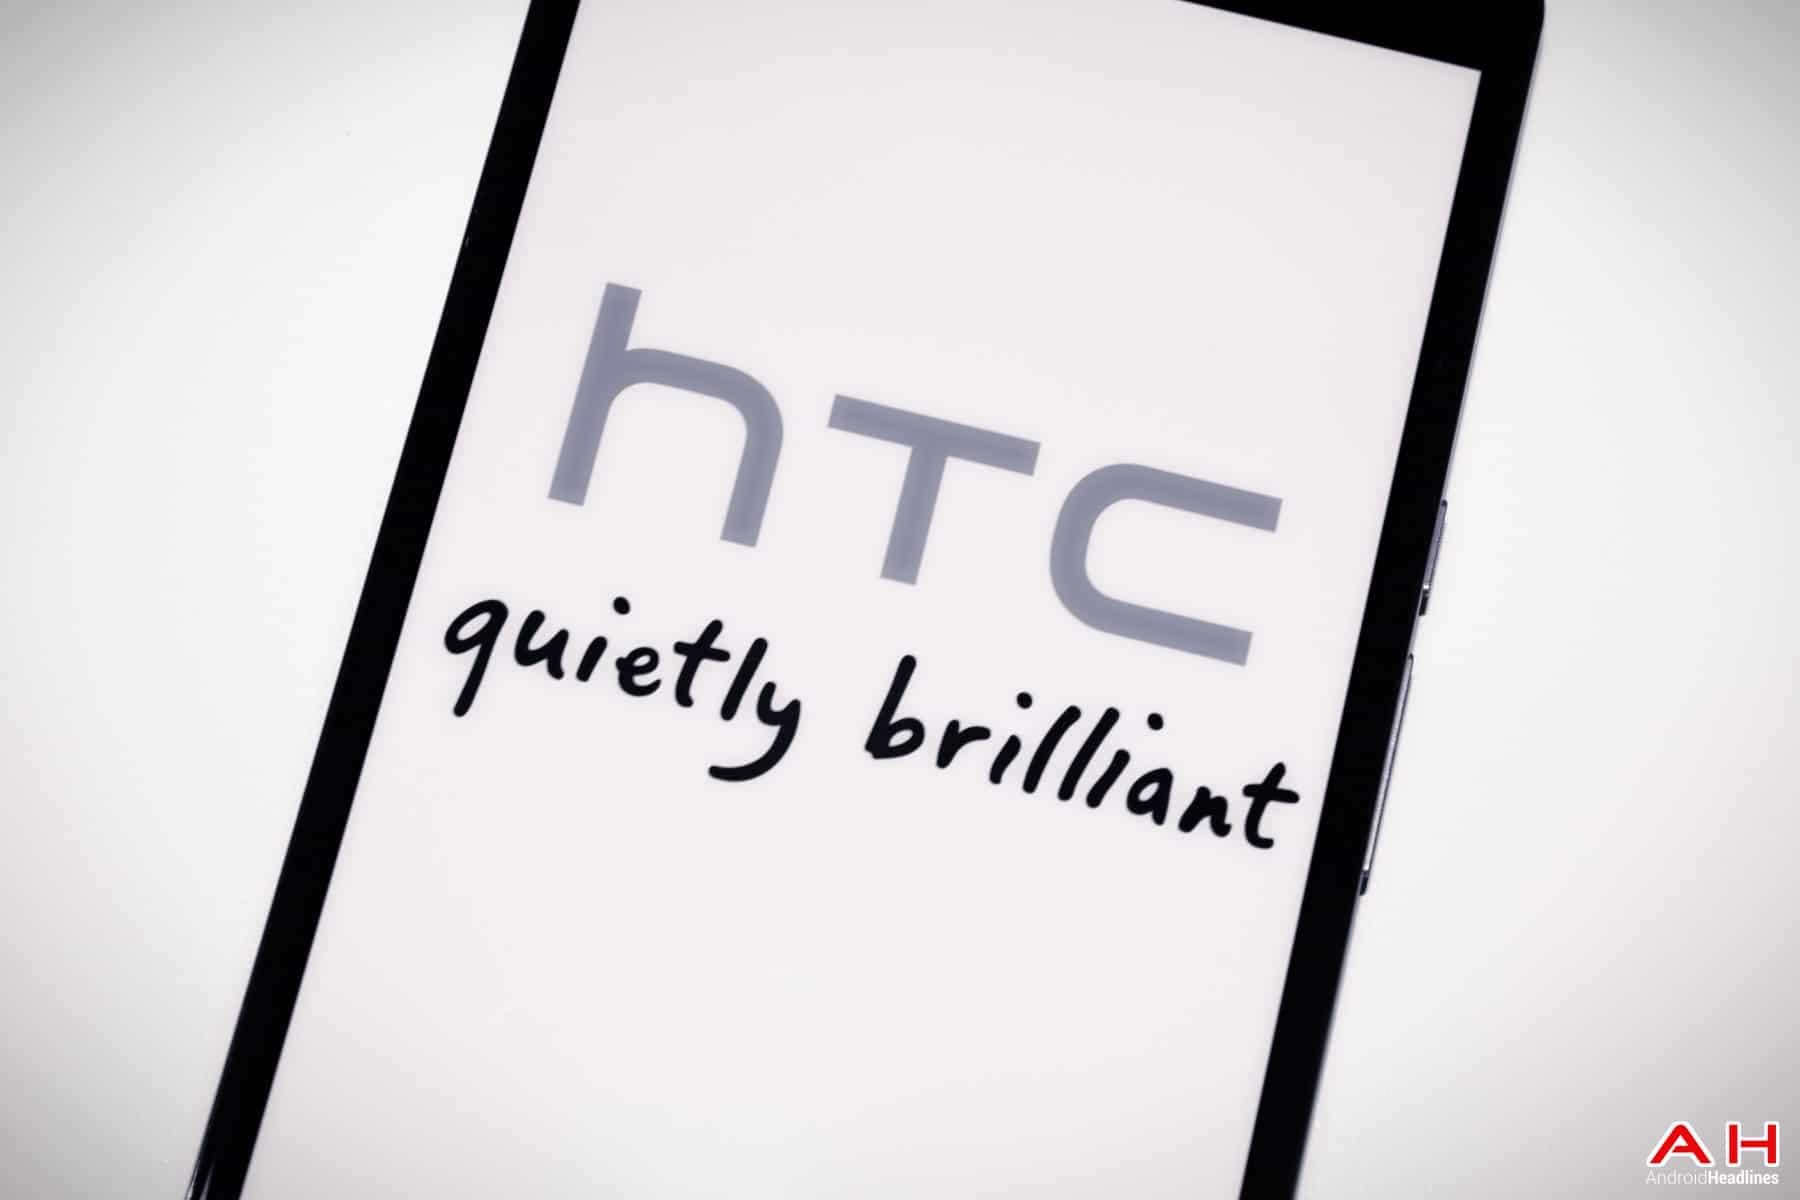 AH 2015 HTC LOGO Chris Sept-17